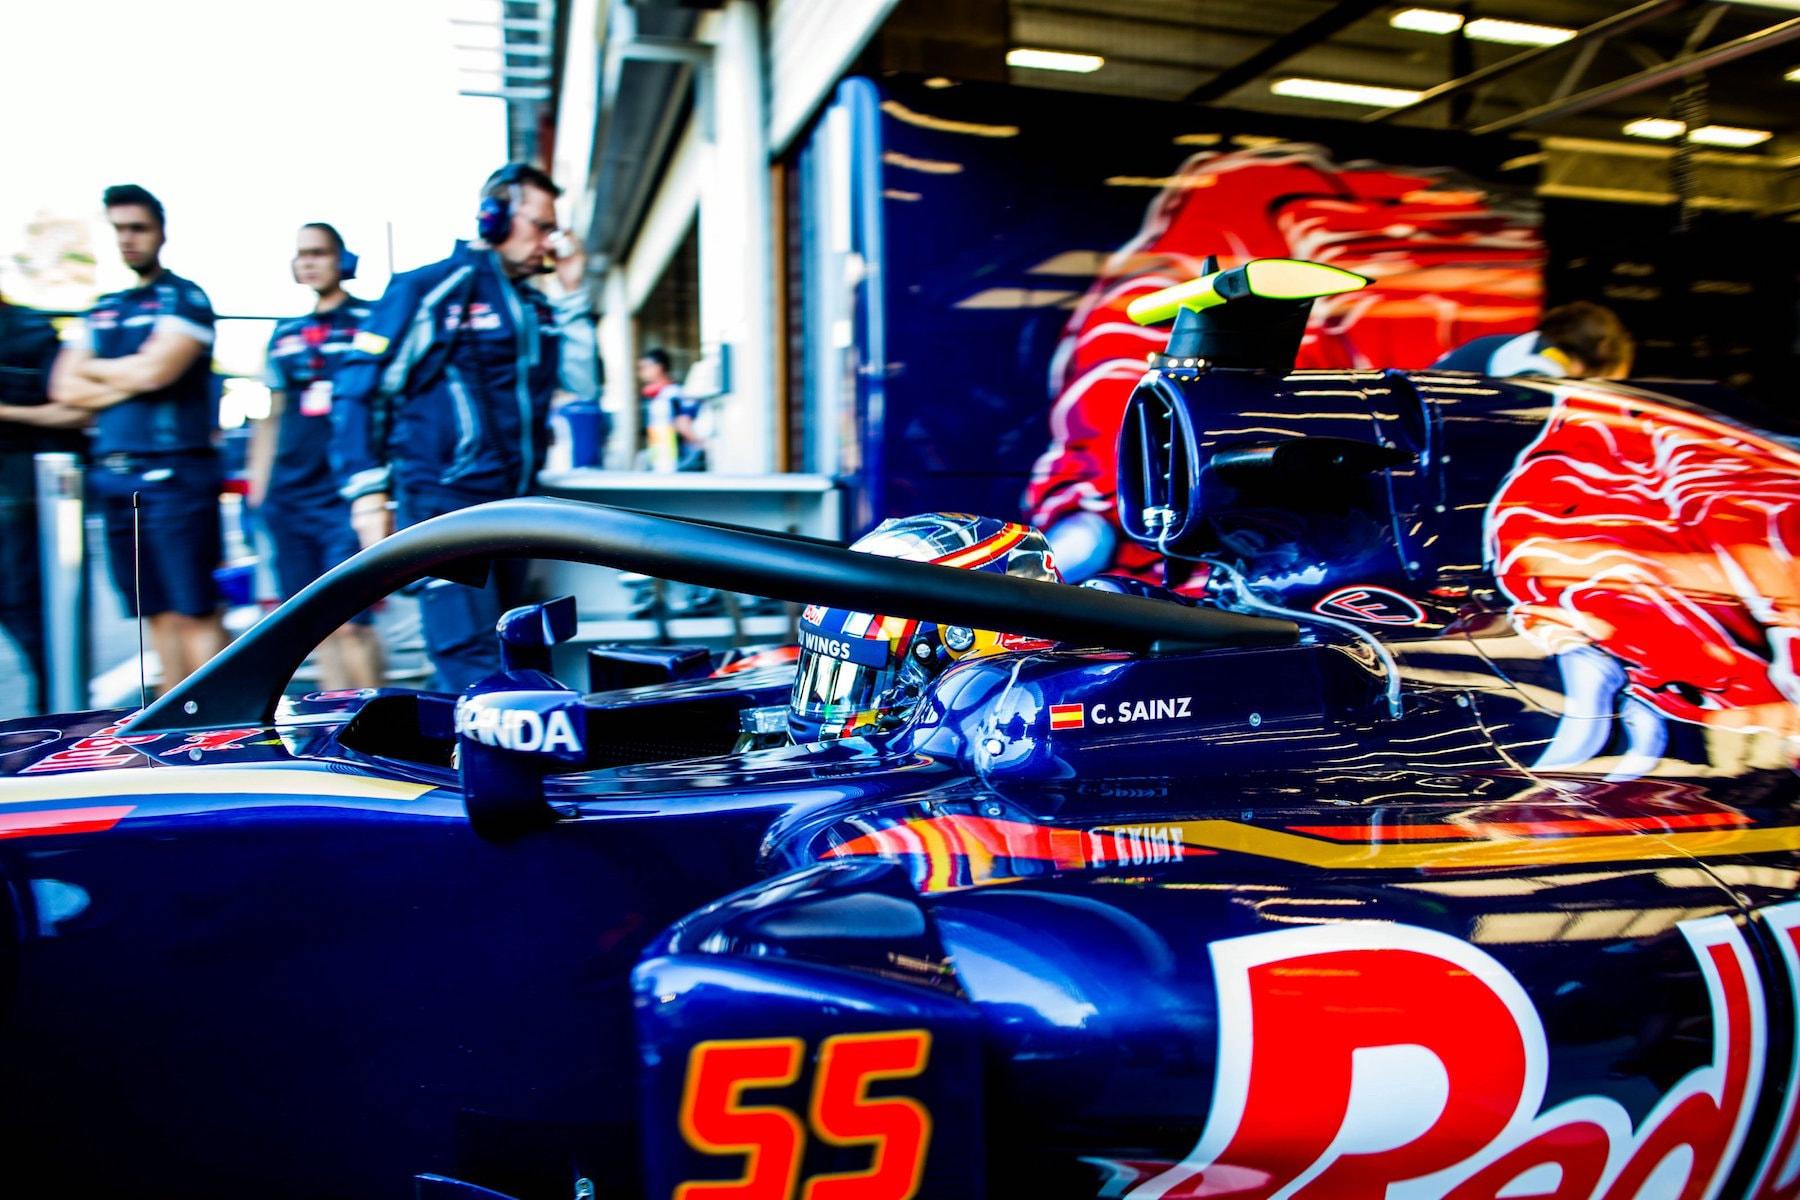 Salracing - Carlos Sainz's Toro Rosso with halo